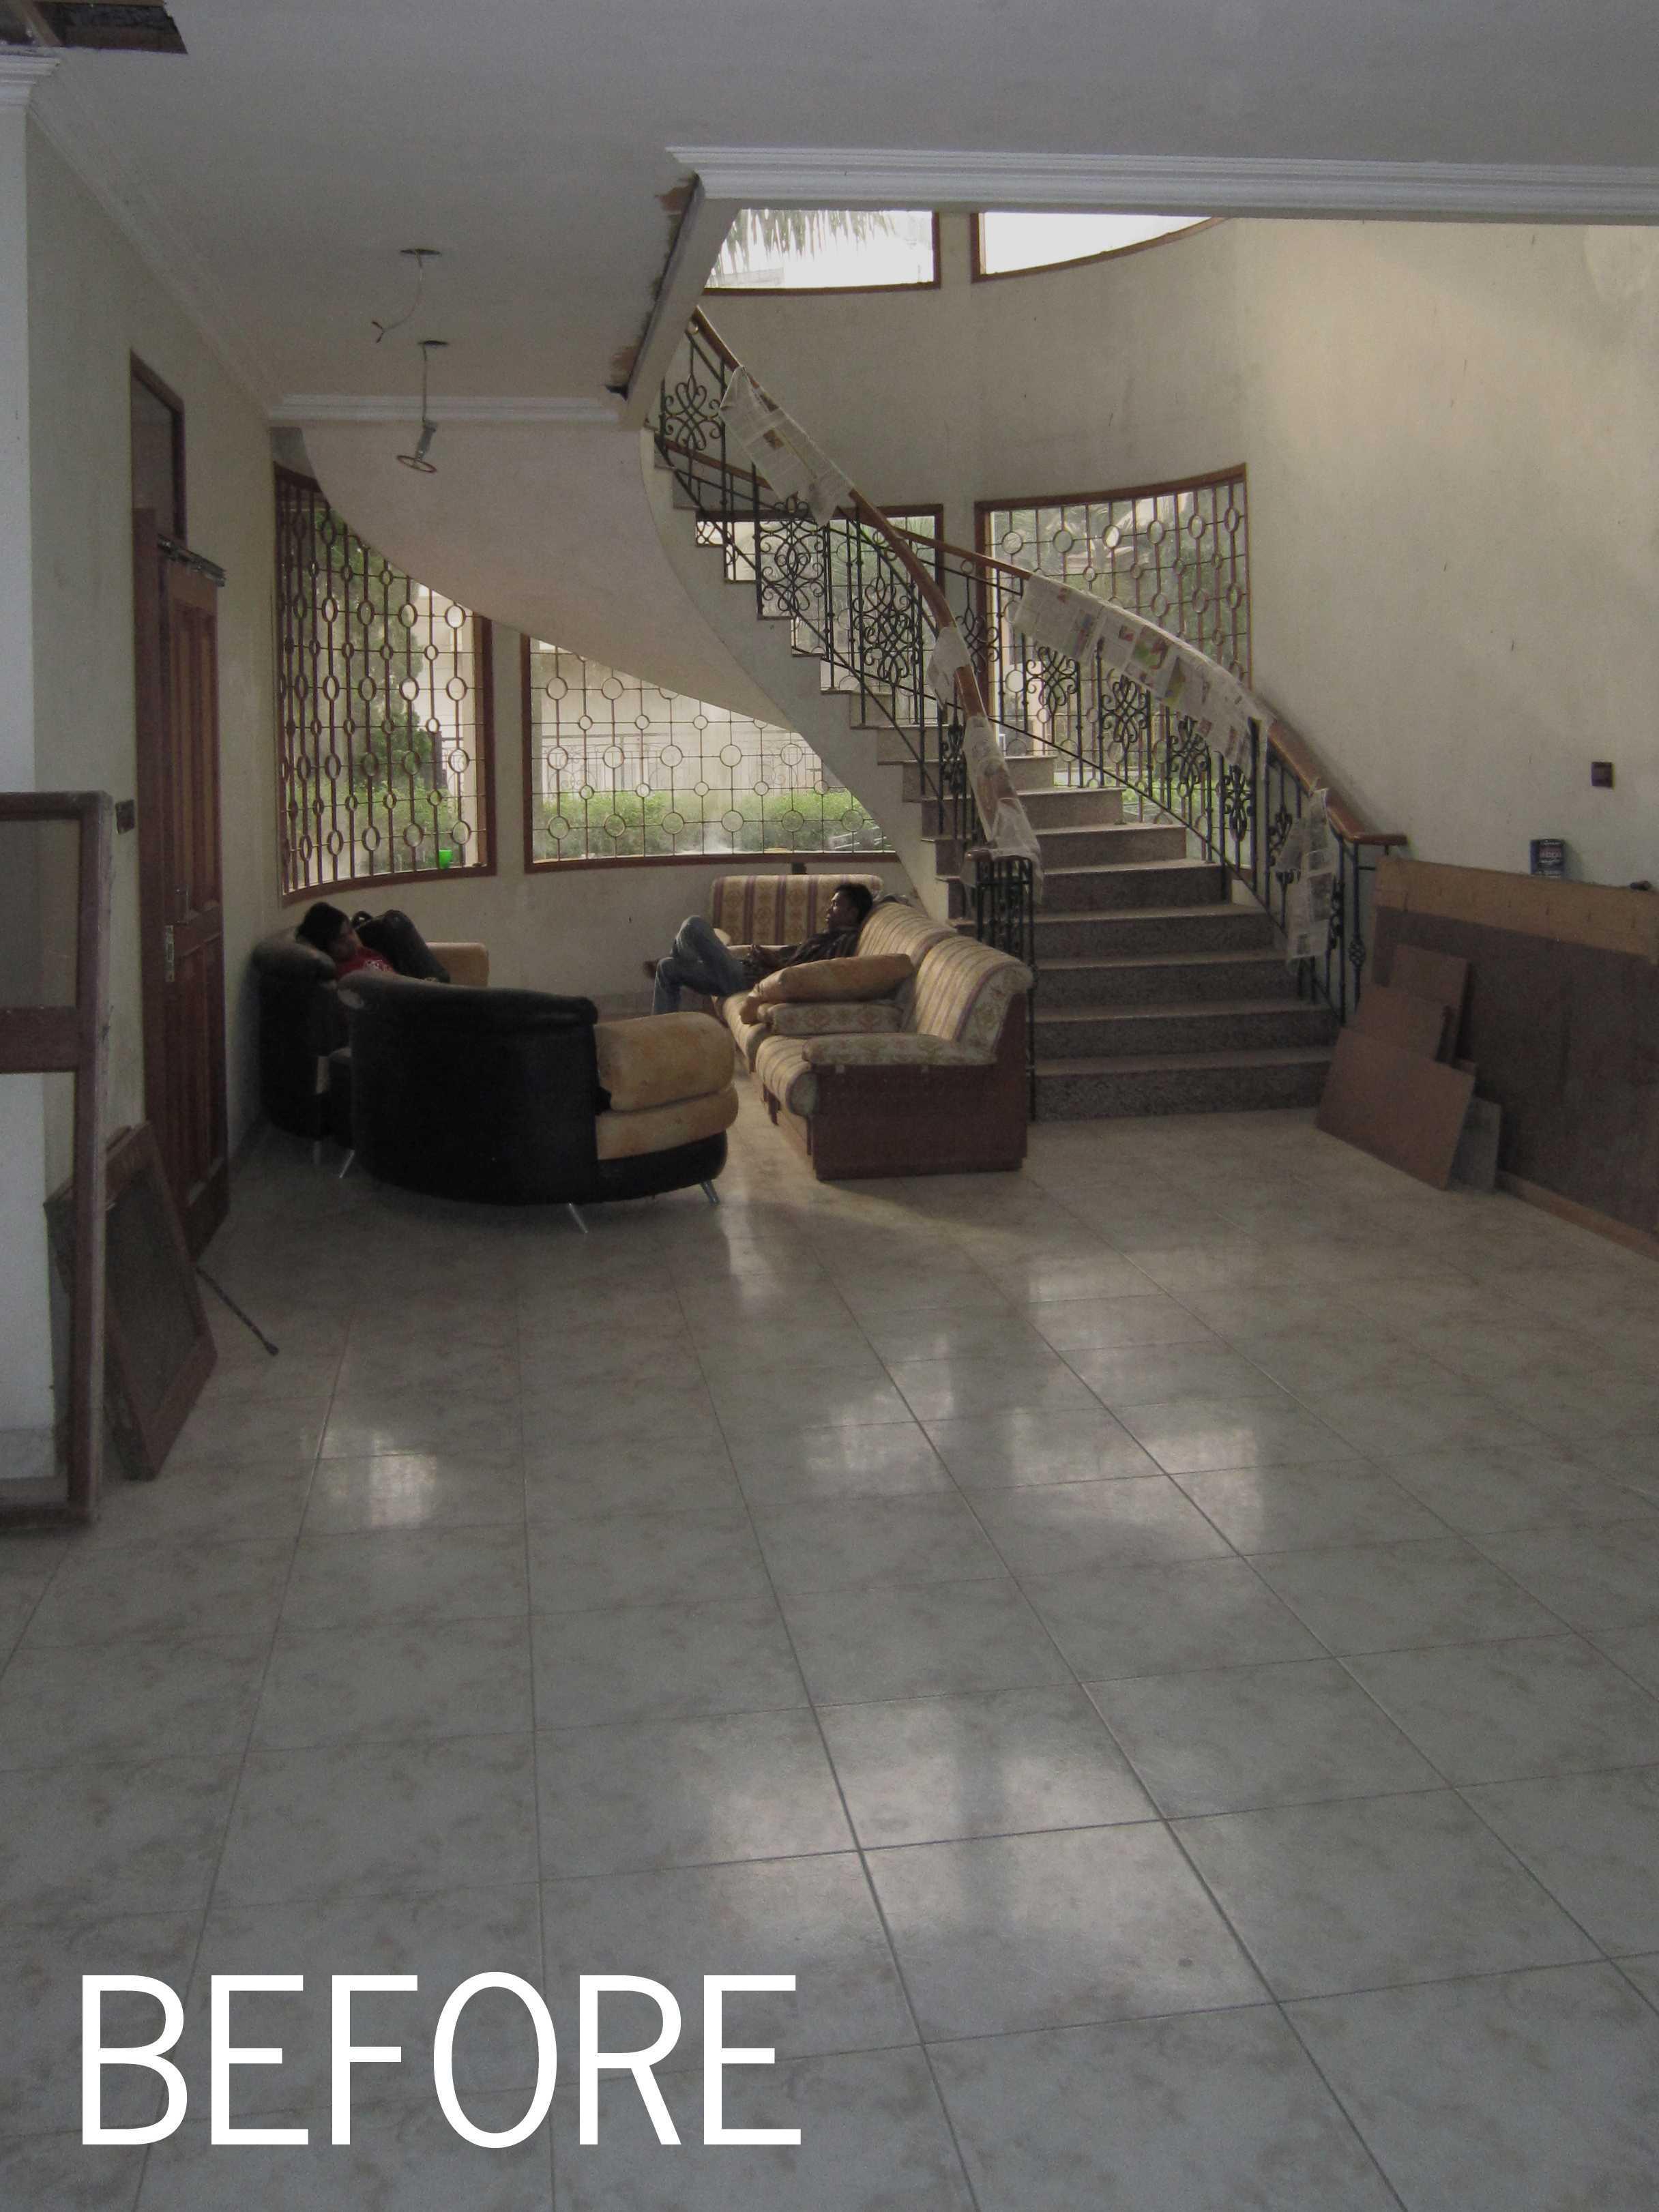 Arkitekt.id Setraduta Kencana Bandung Bandung Sk House - Existing  <P>Kondisi Asal Ruang Keluarga Dengan Tangga Melingkar Sebelum Dilakukan Proses Renovasi</p> 69581